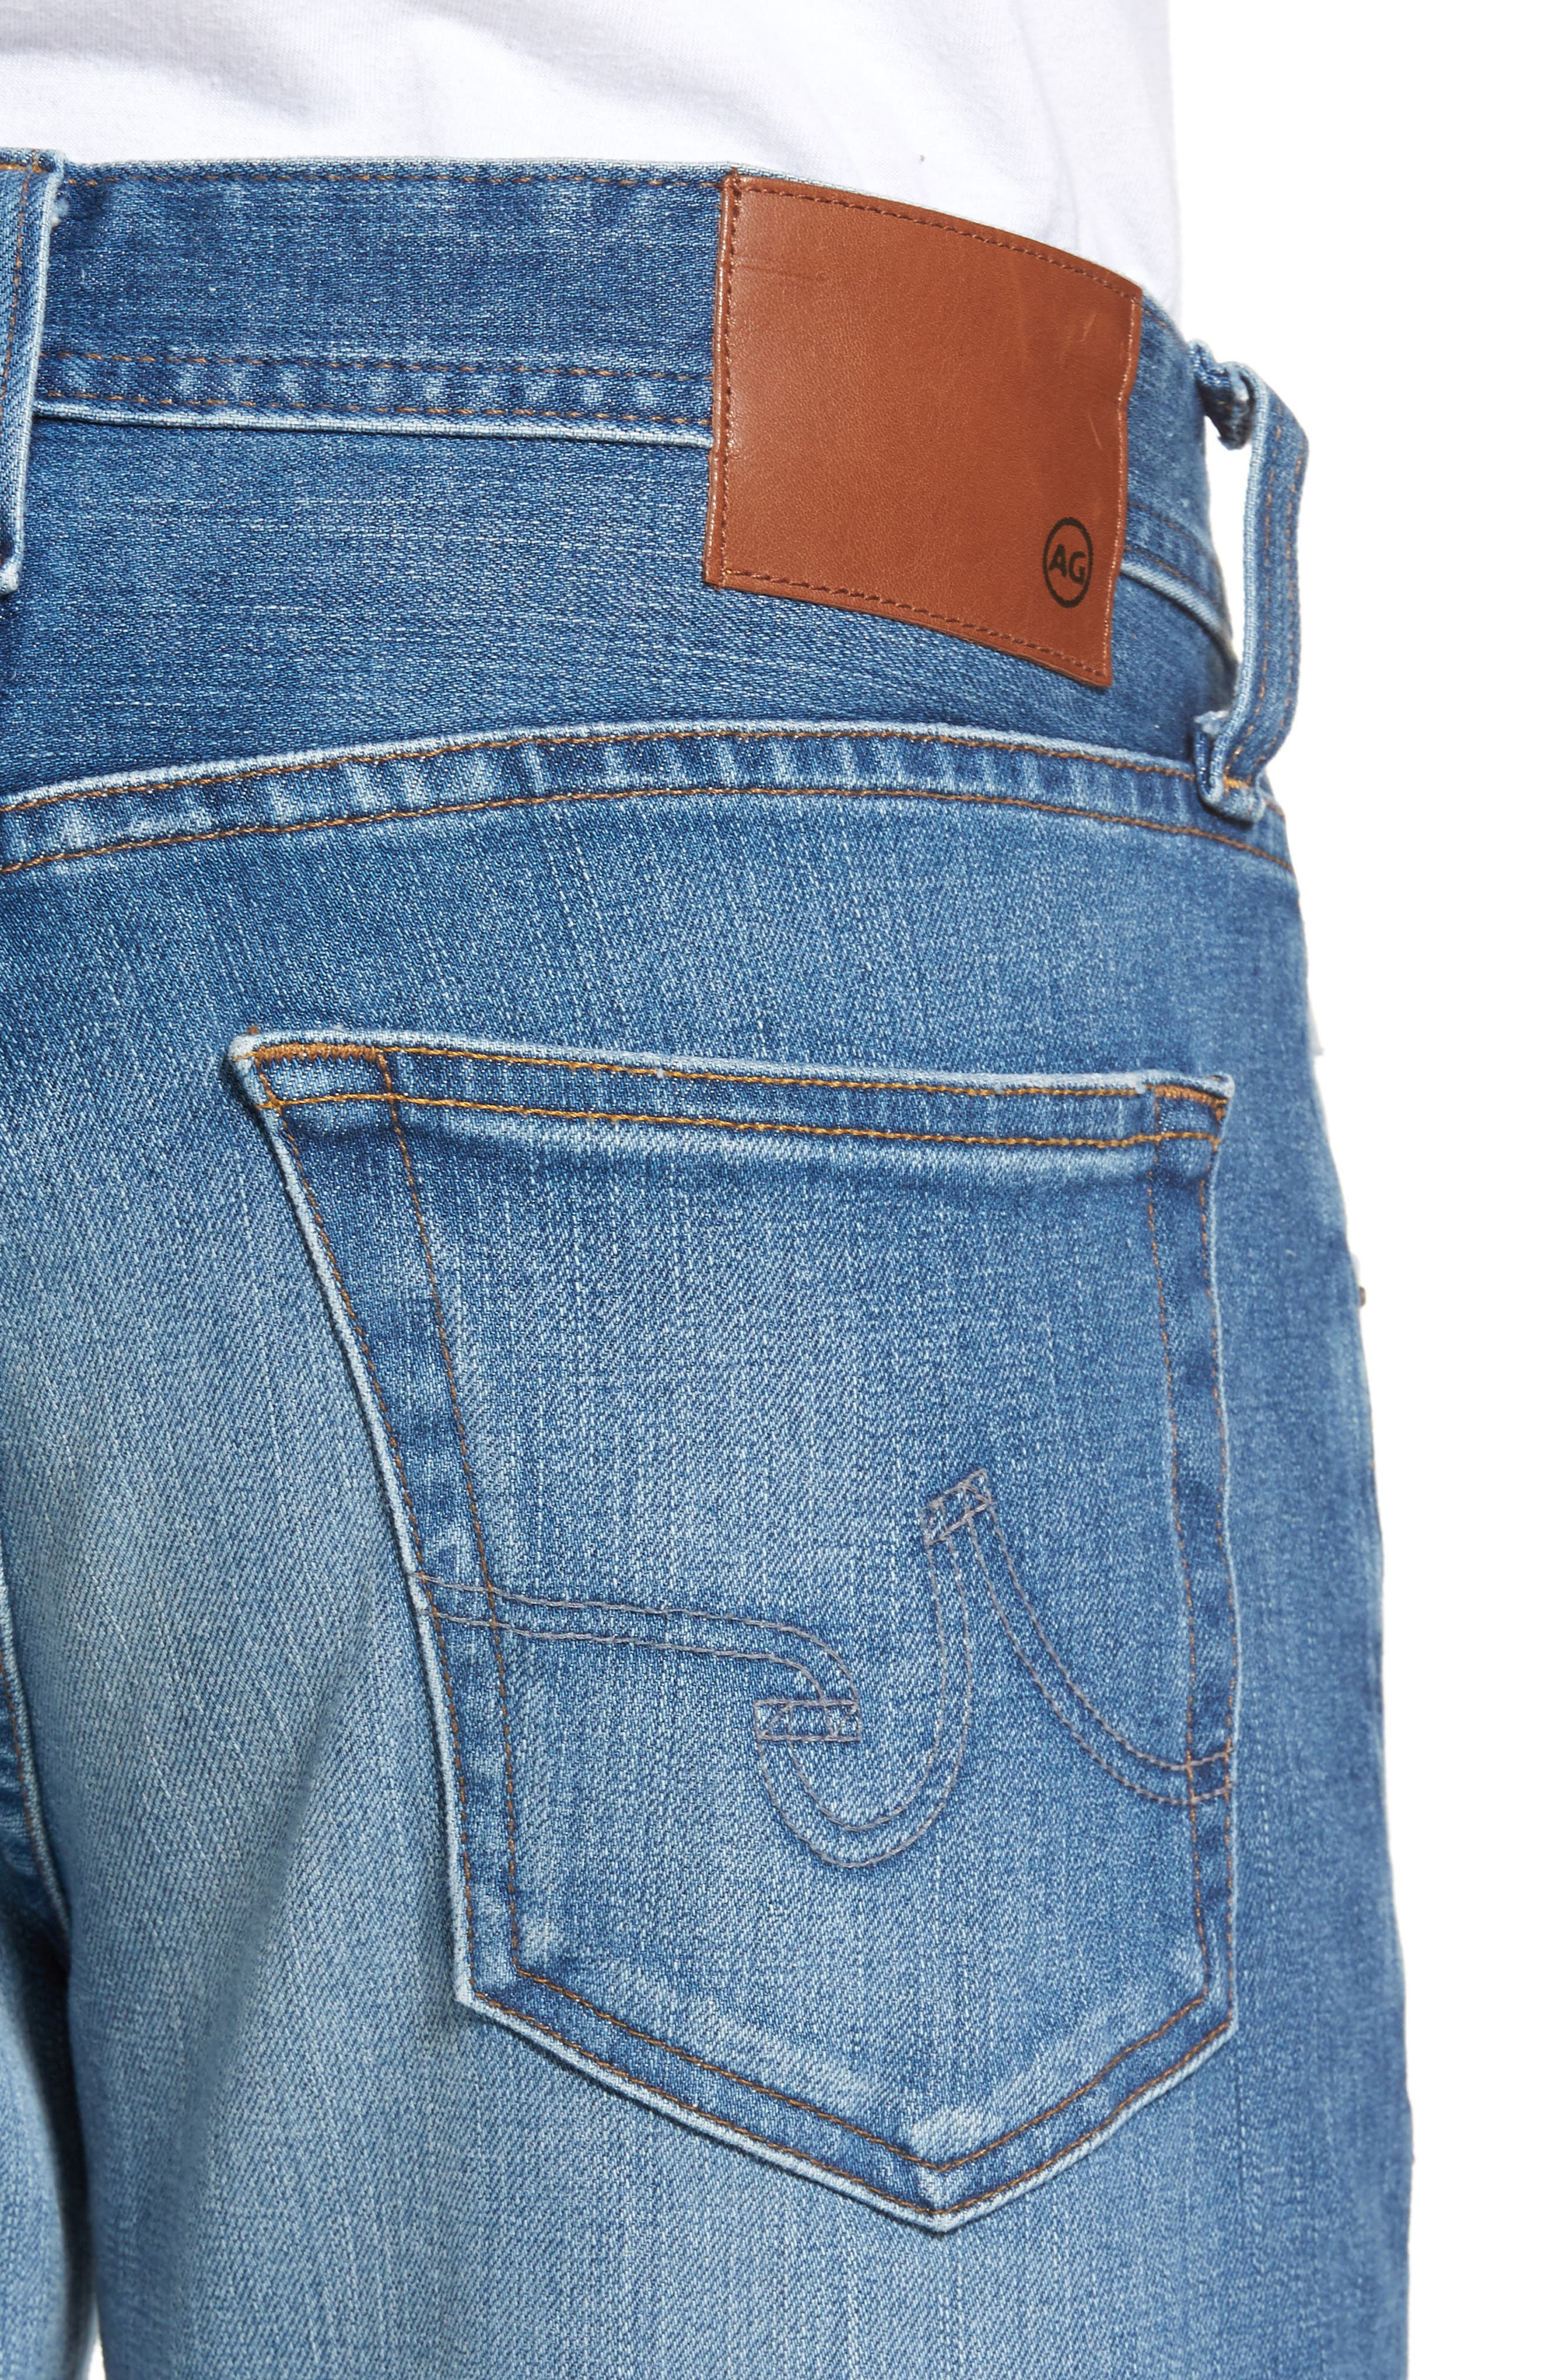 Graduate Slim Straight Fit Jeans,                             Alternate thumbnail 4, color,                             456